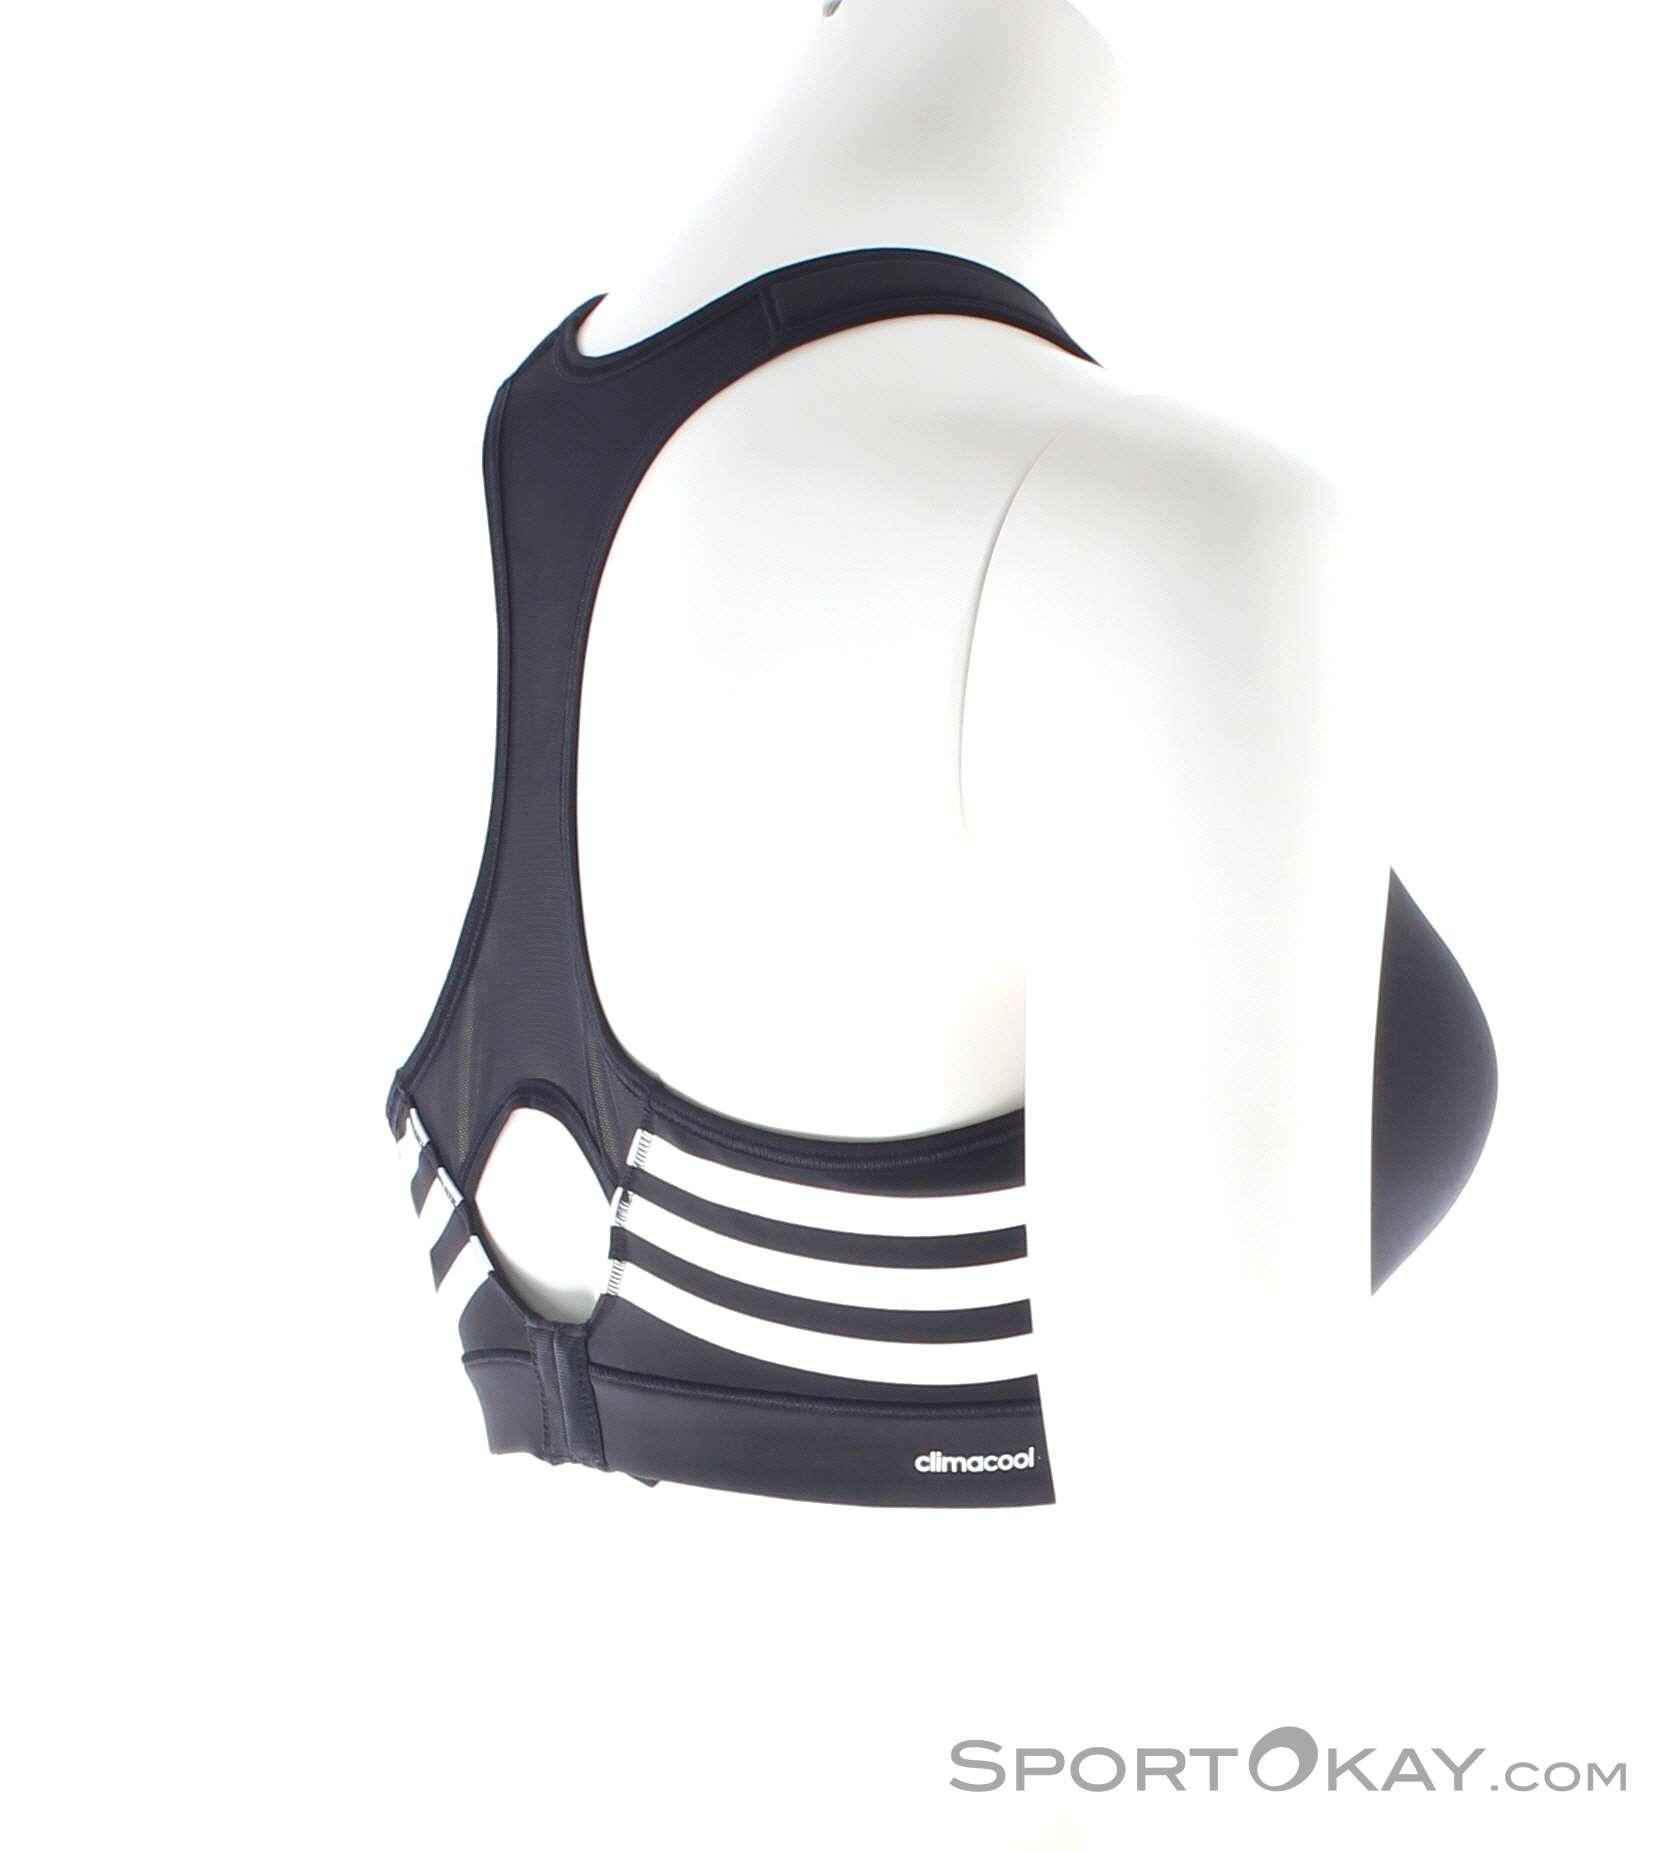 dd1e985274 adidas Infinite Series Racerback Womens Sports Bra - Tops - Fitness ...